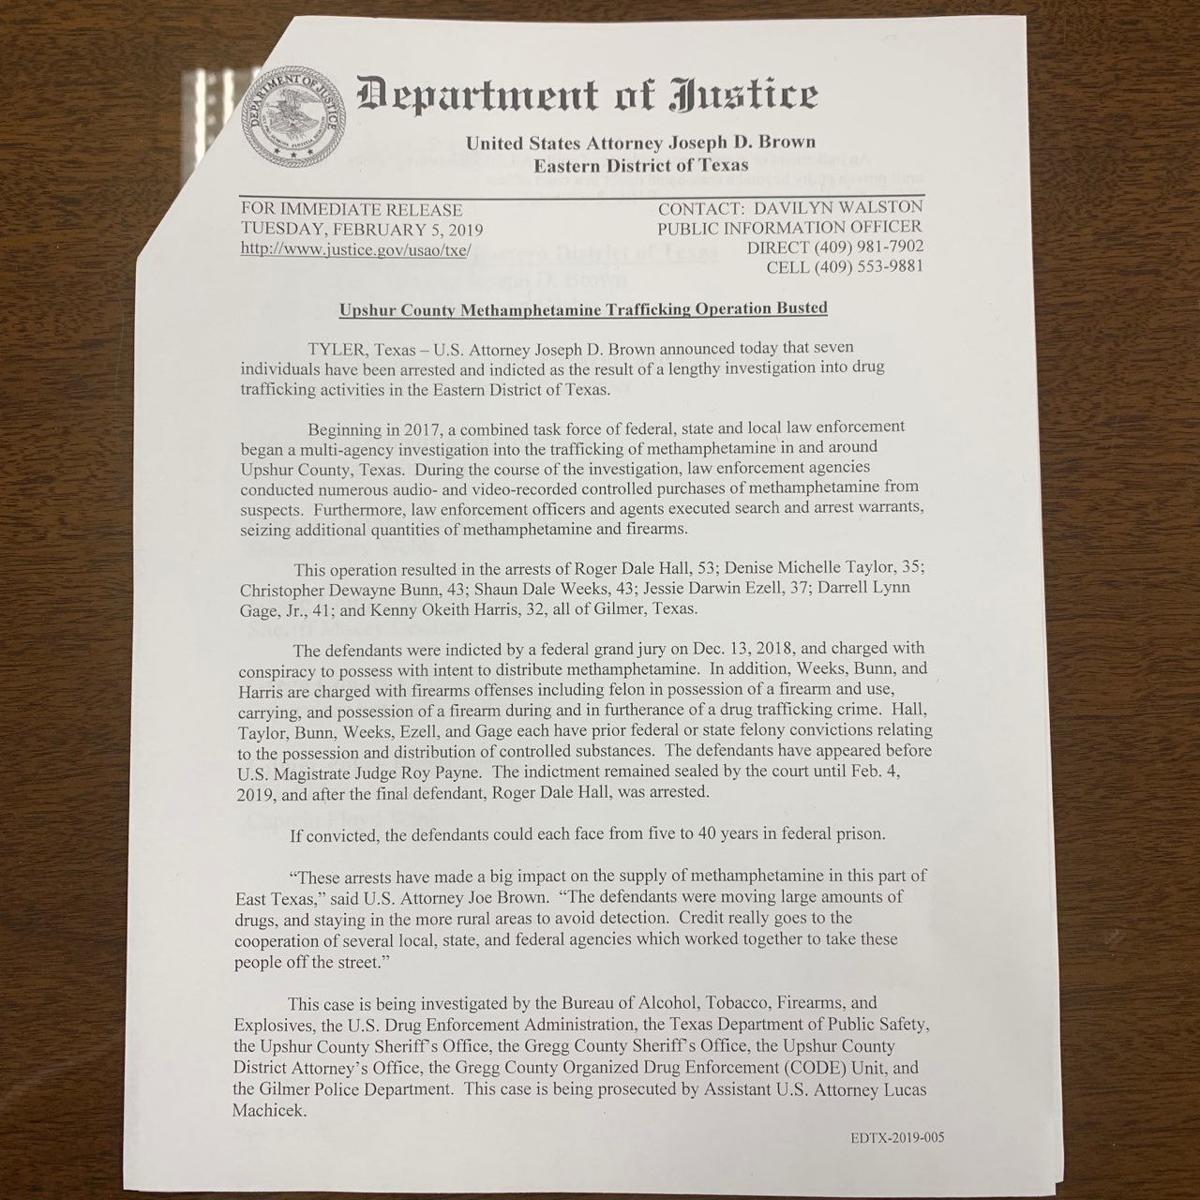 U S  attorney: Operation, arrests make 'big impact' on East Texas